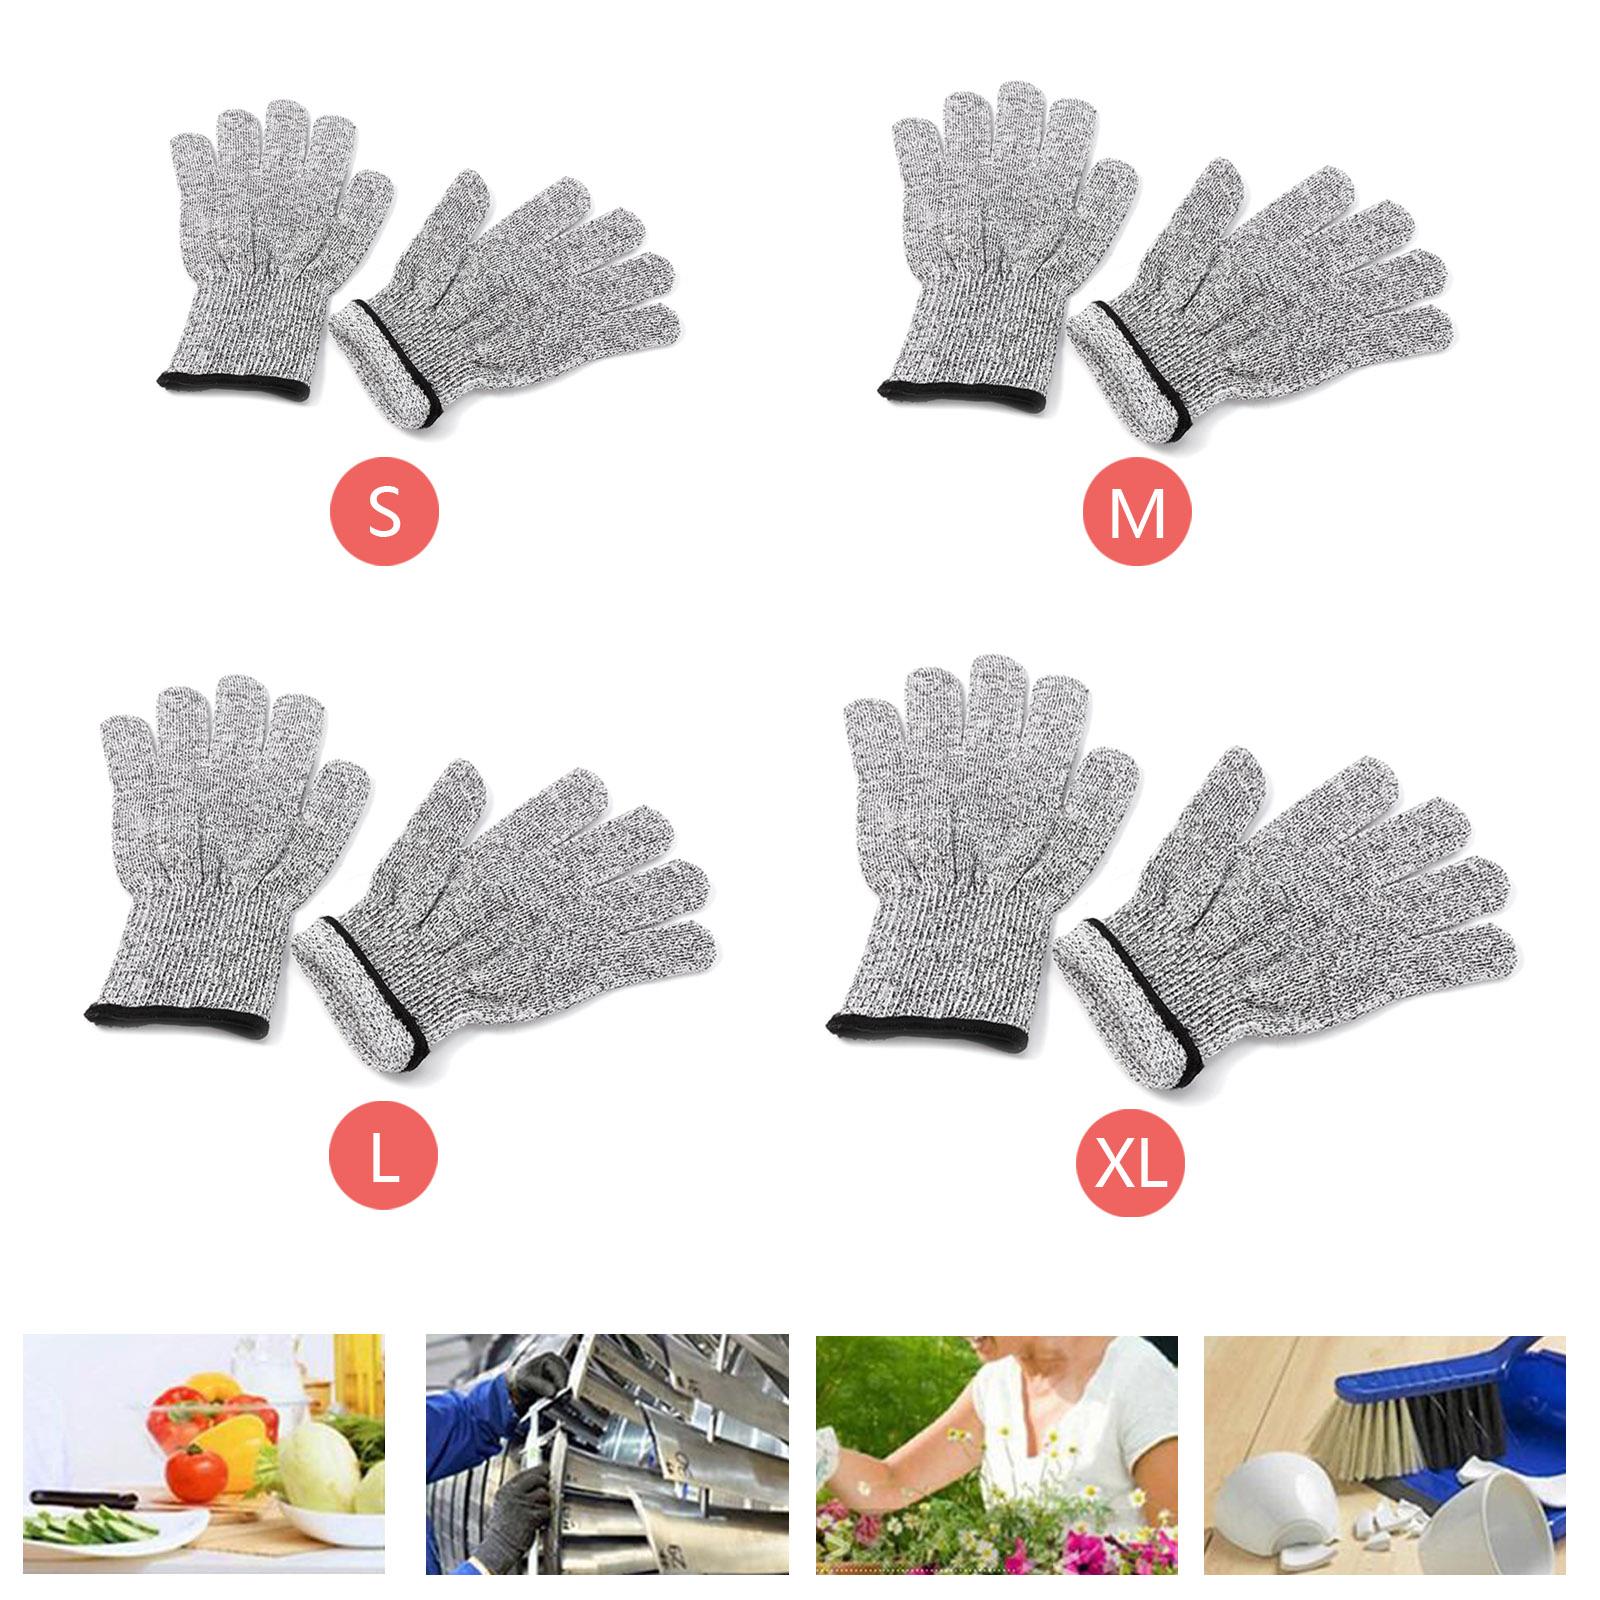 Schnittfeste schnittschutzhandschuhe arbeit kuchen level 5 for Schnittschutzhandschuhe küche